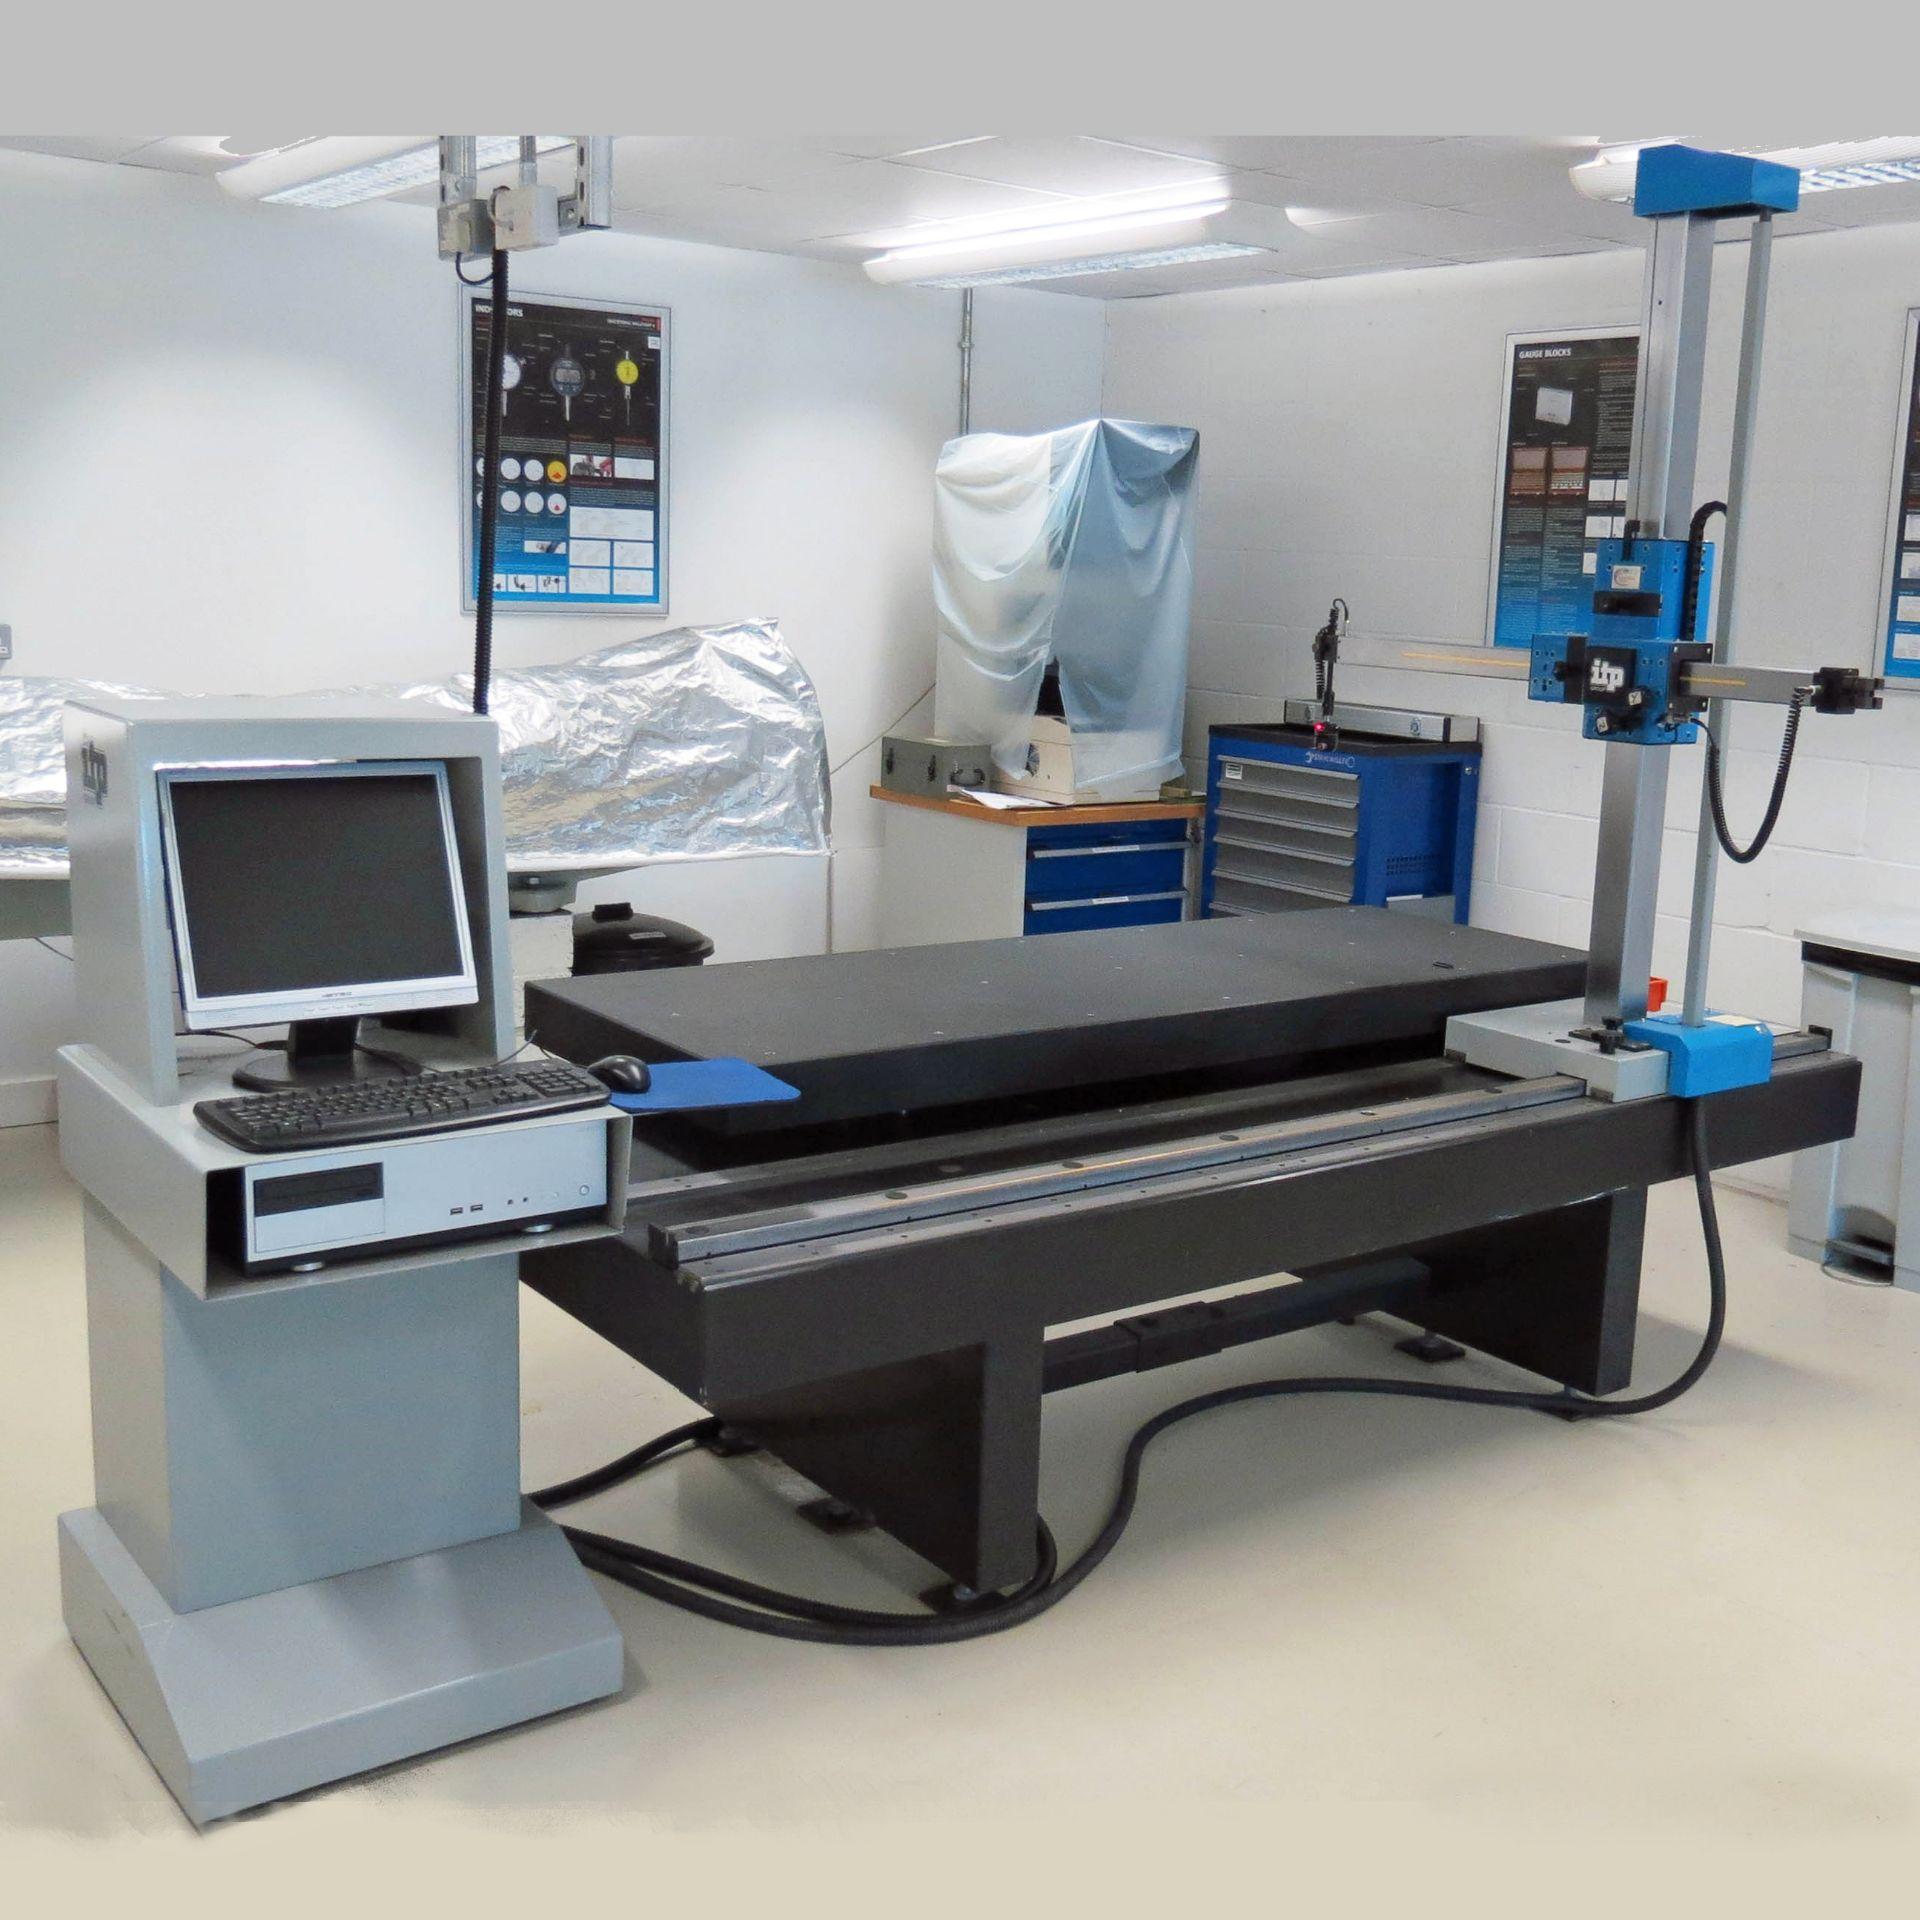 Lot 9 - ITP Type HA8 Coordinate Measuring Machine.